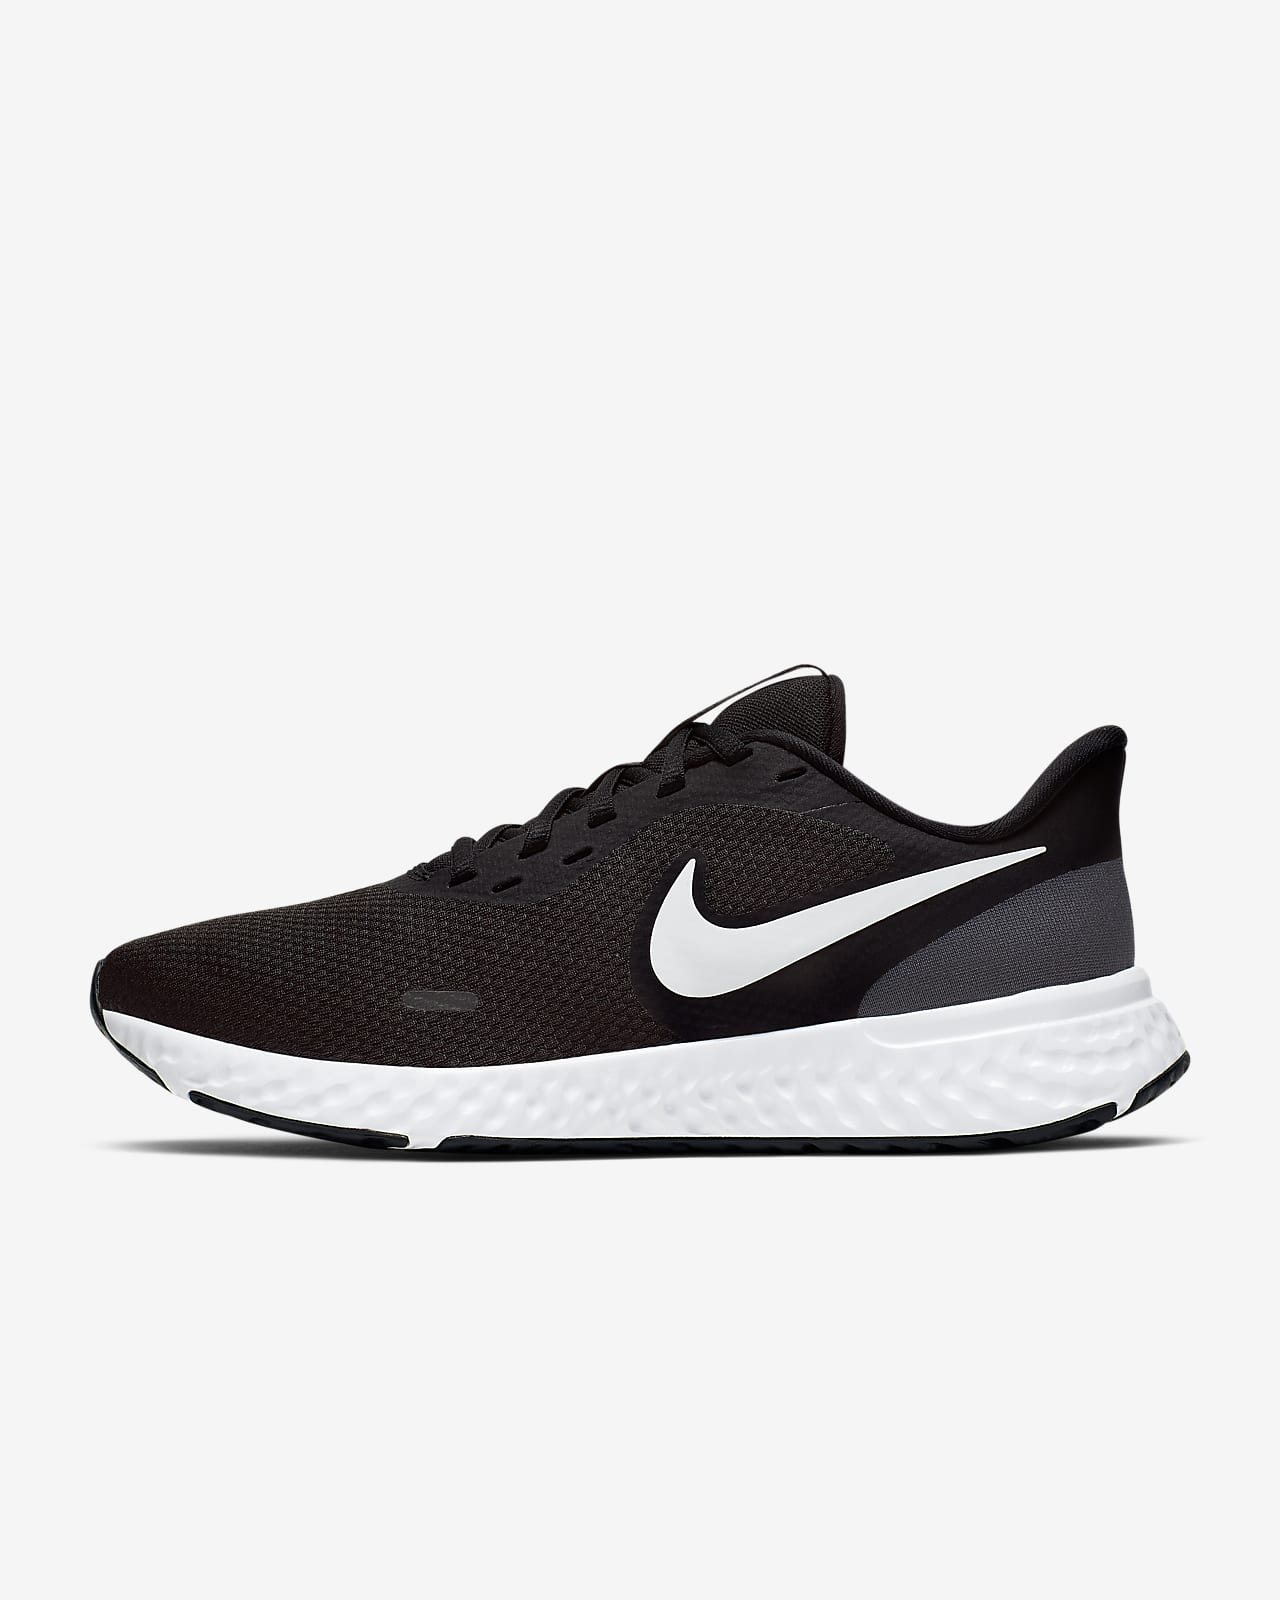 Dámská běžecká bota Nike Revolution 5